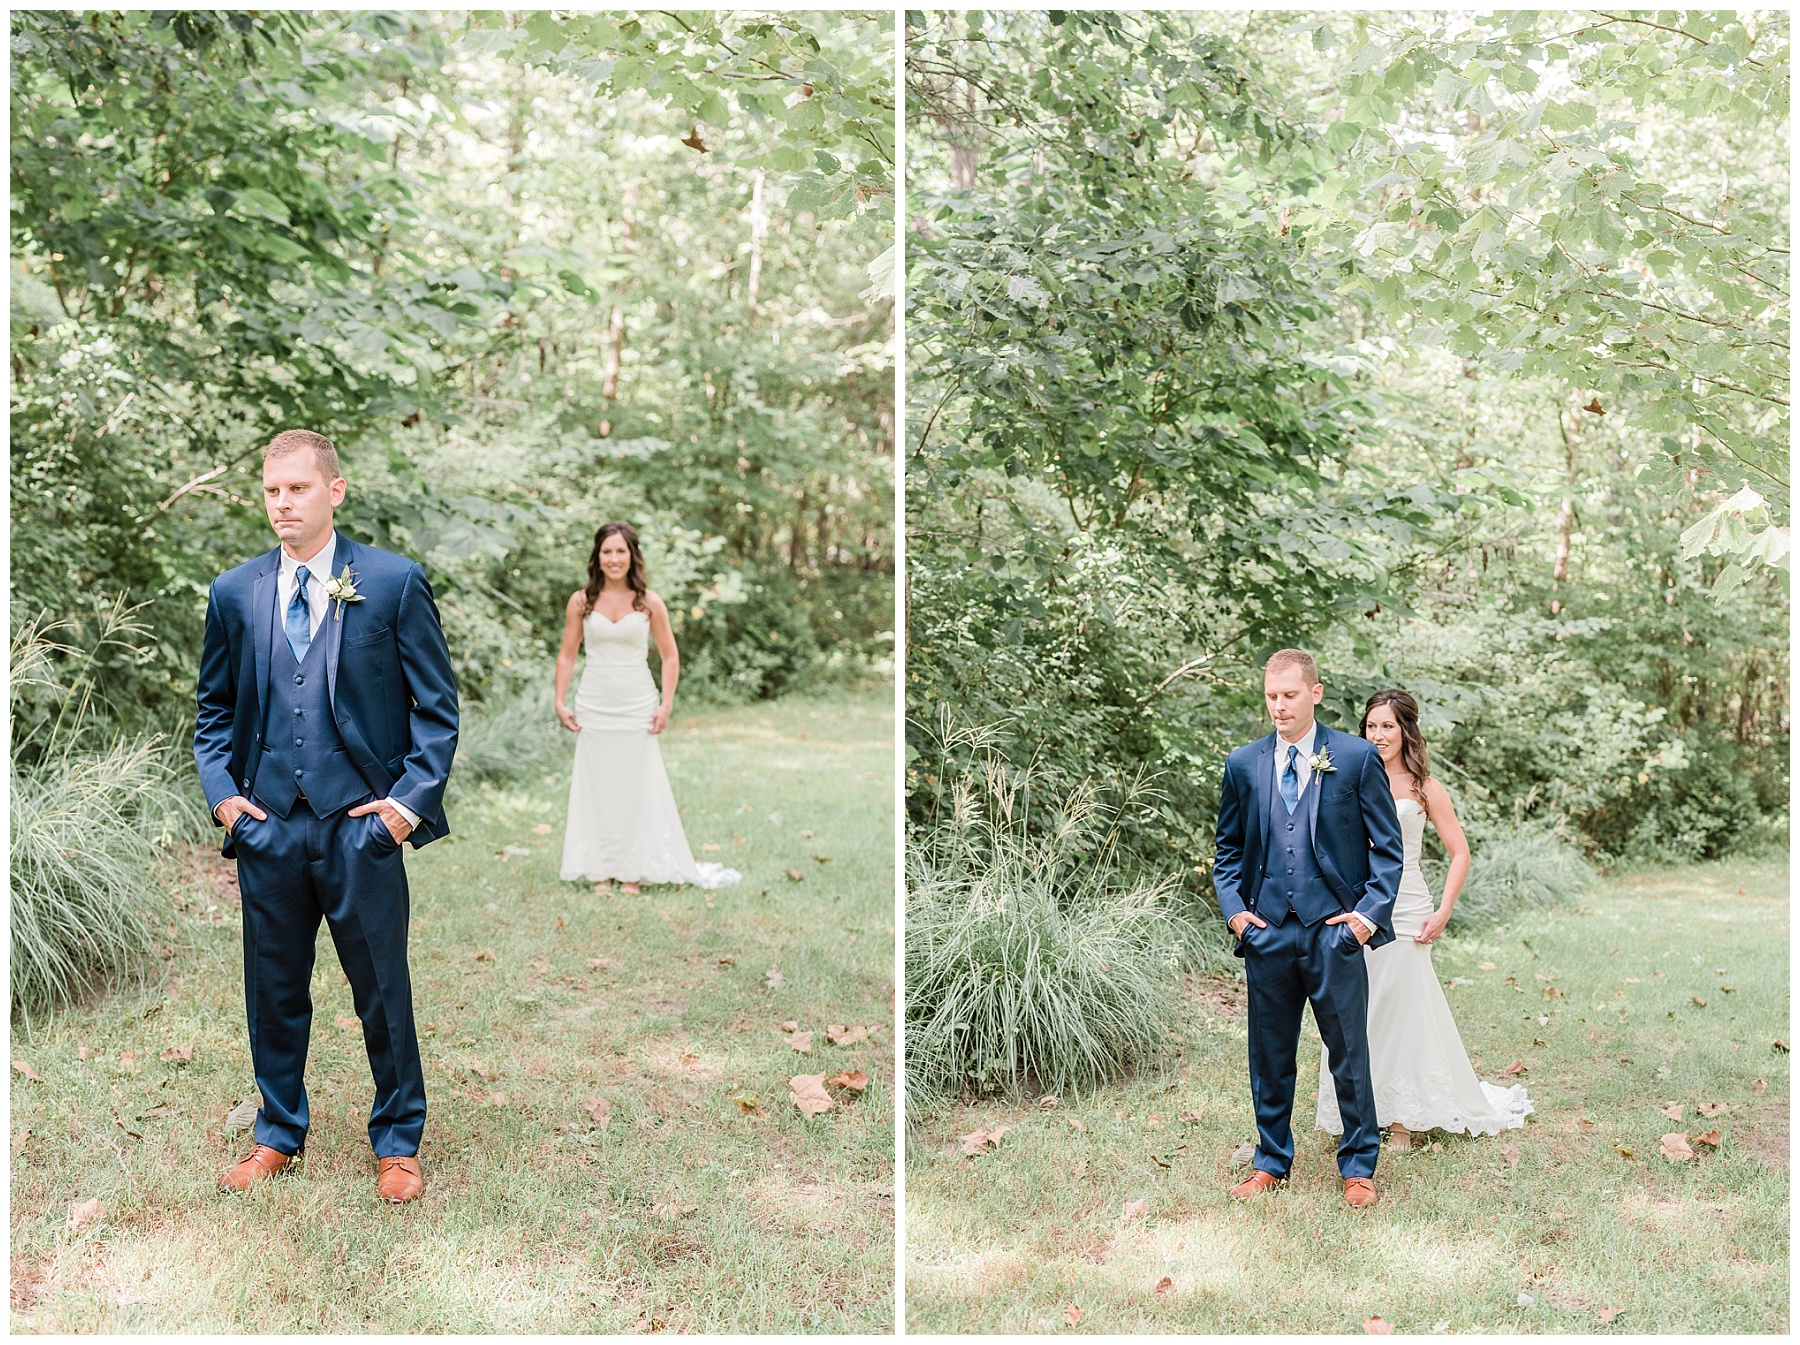 Romantic Summer Sunset Wedding Ceremony at Little Piney Lodge St. Louis Missouri by Kelsi Kliethermes Photography Fine Art Photographer_0030.jpg